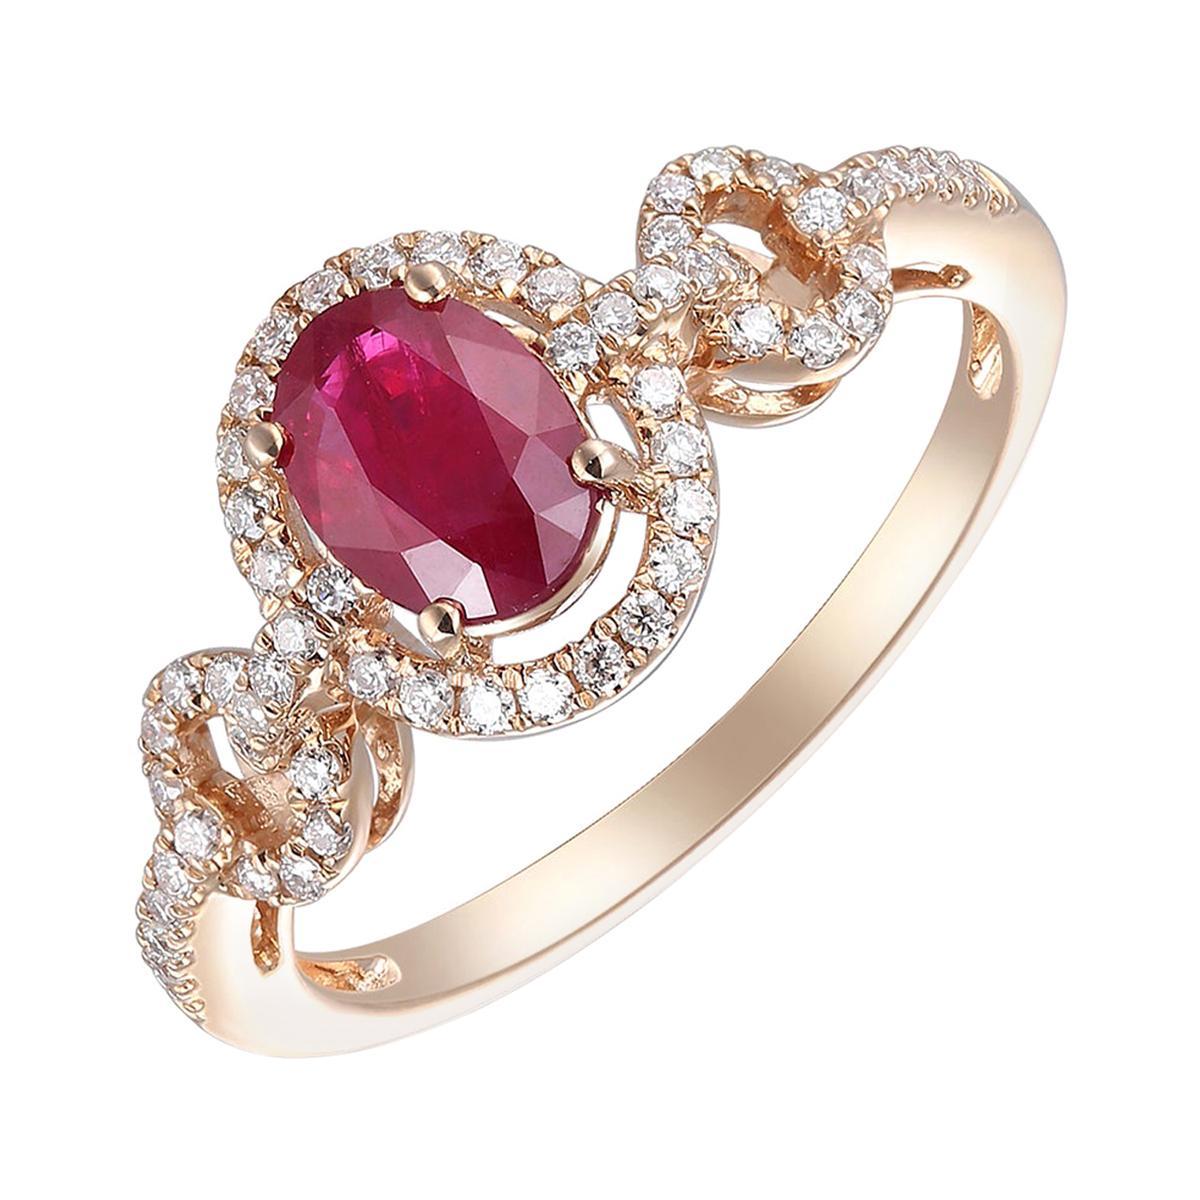 Amazing 14 Karat Pink Gold, Diamond and Ruby Ring